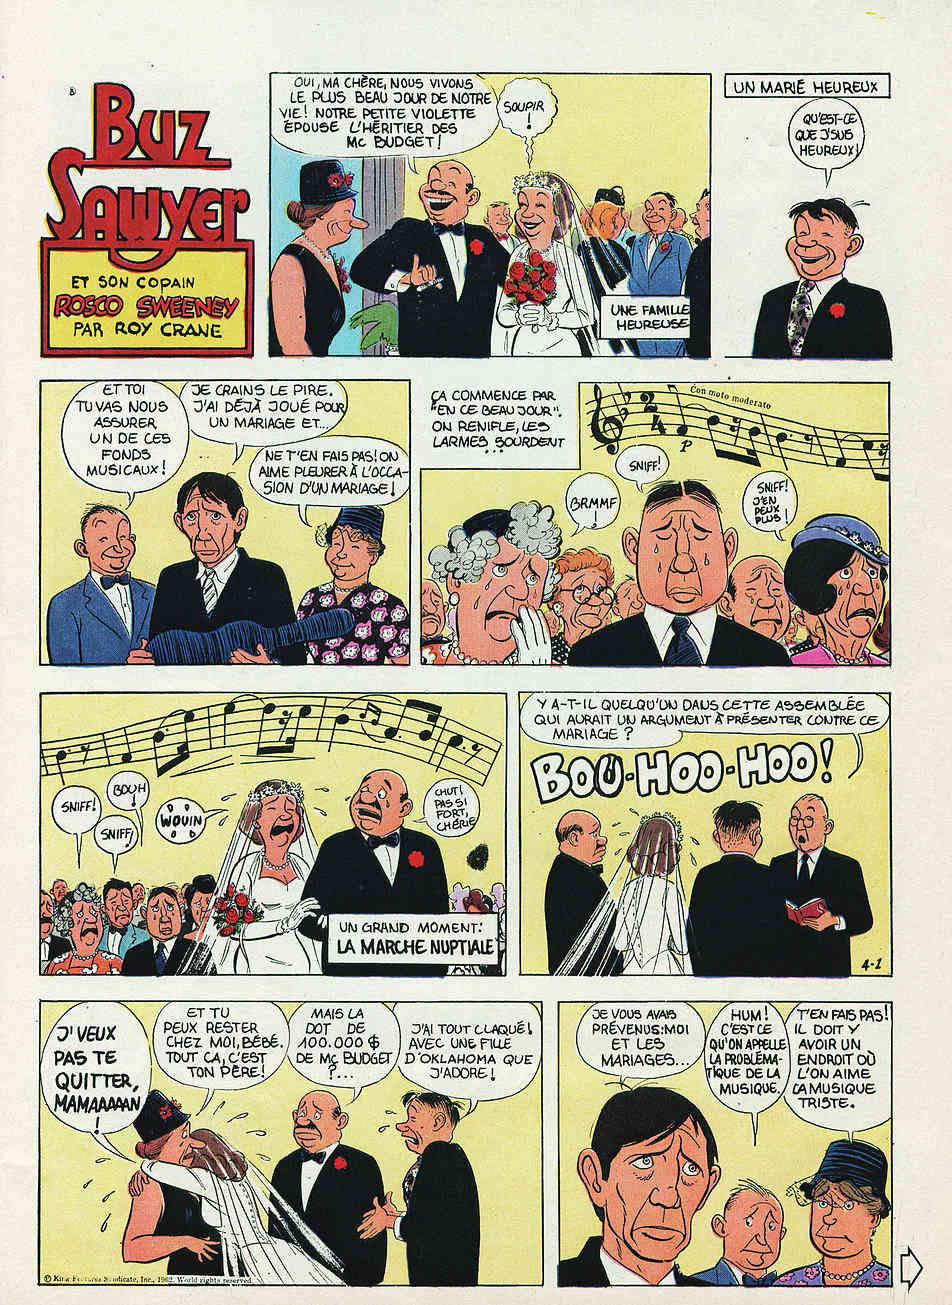 Wash Tubbs, Buz Sawyer par Roy Crane - Page 3 Cranes15